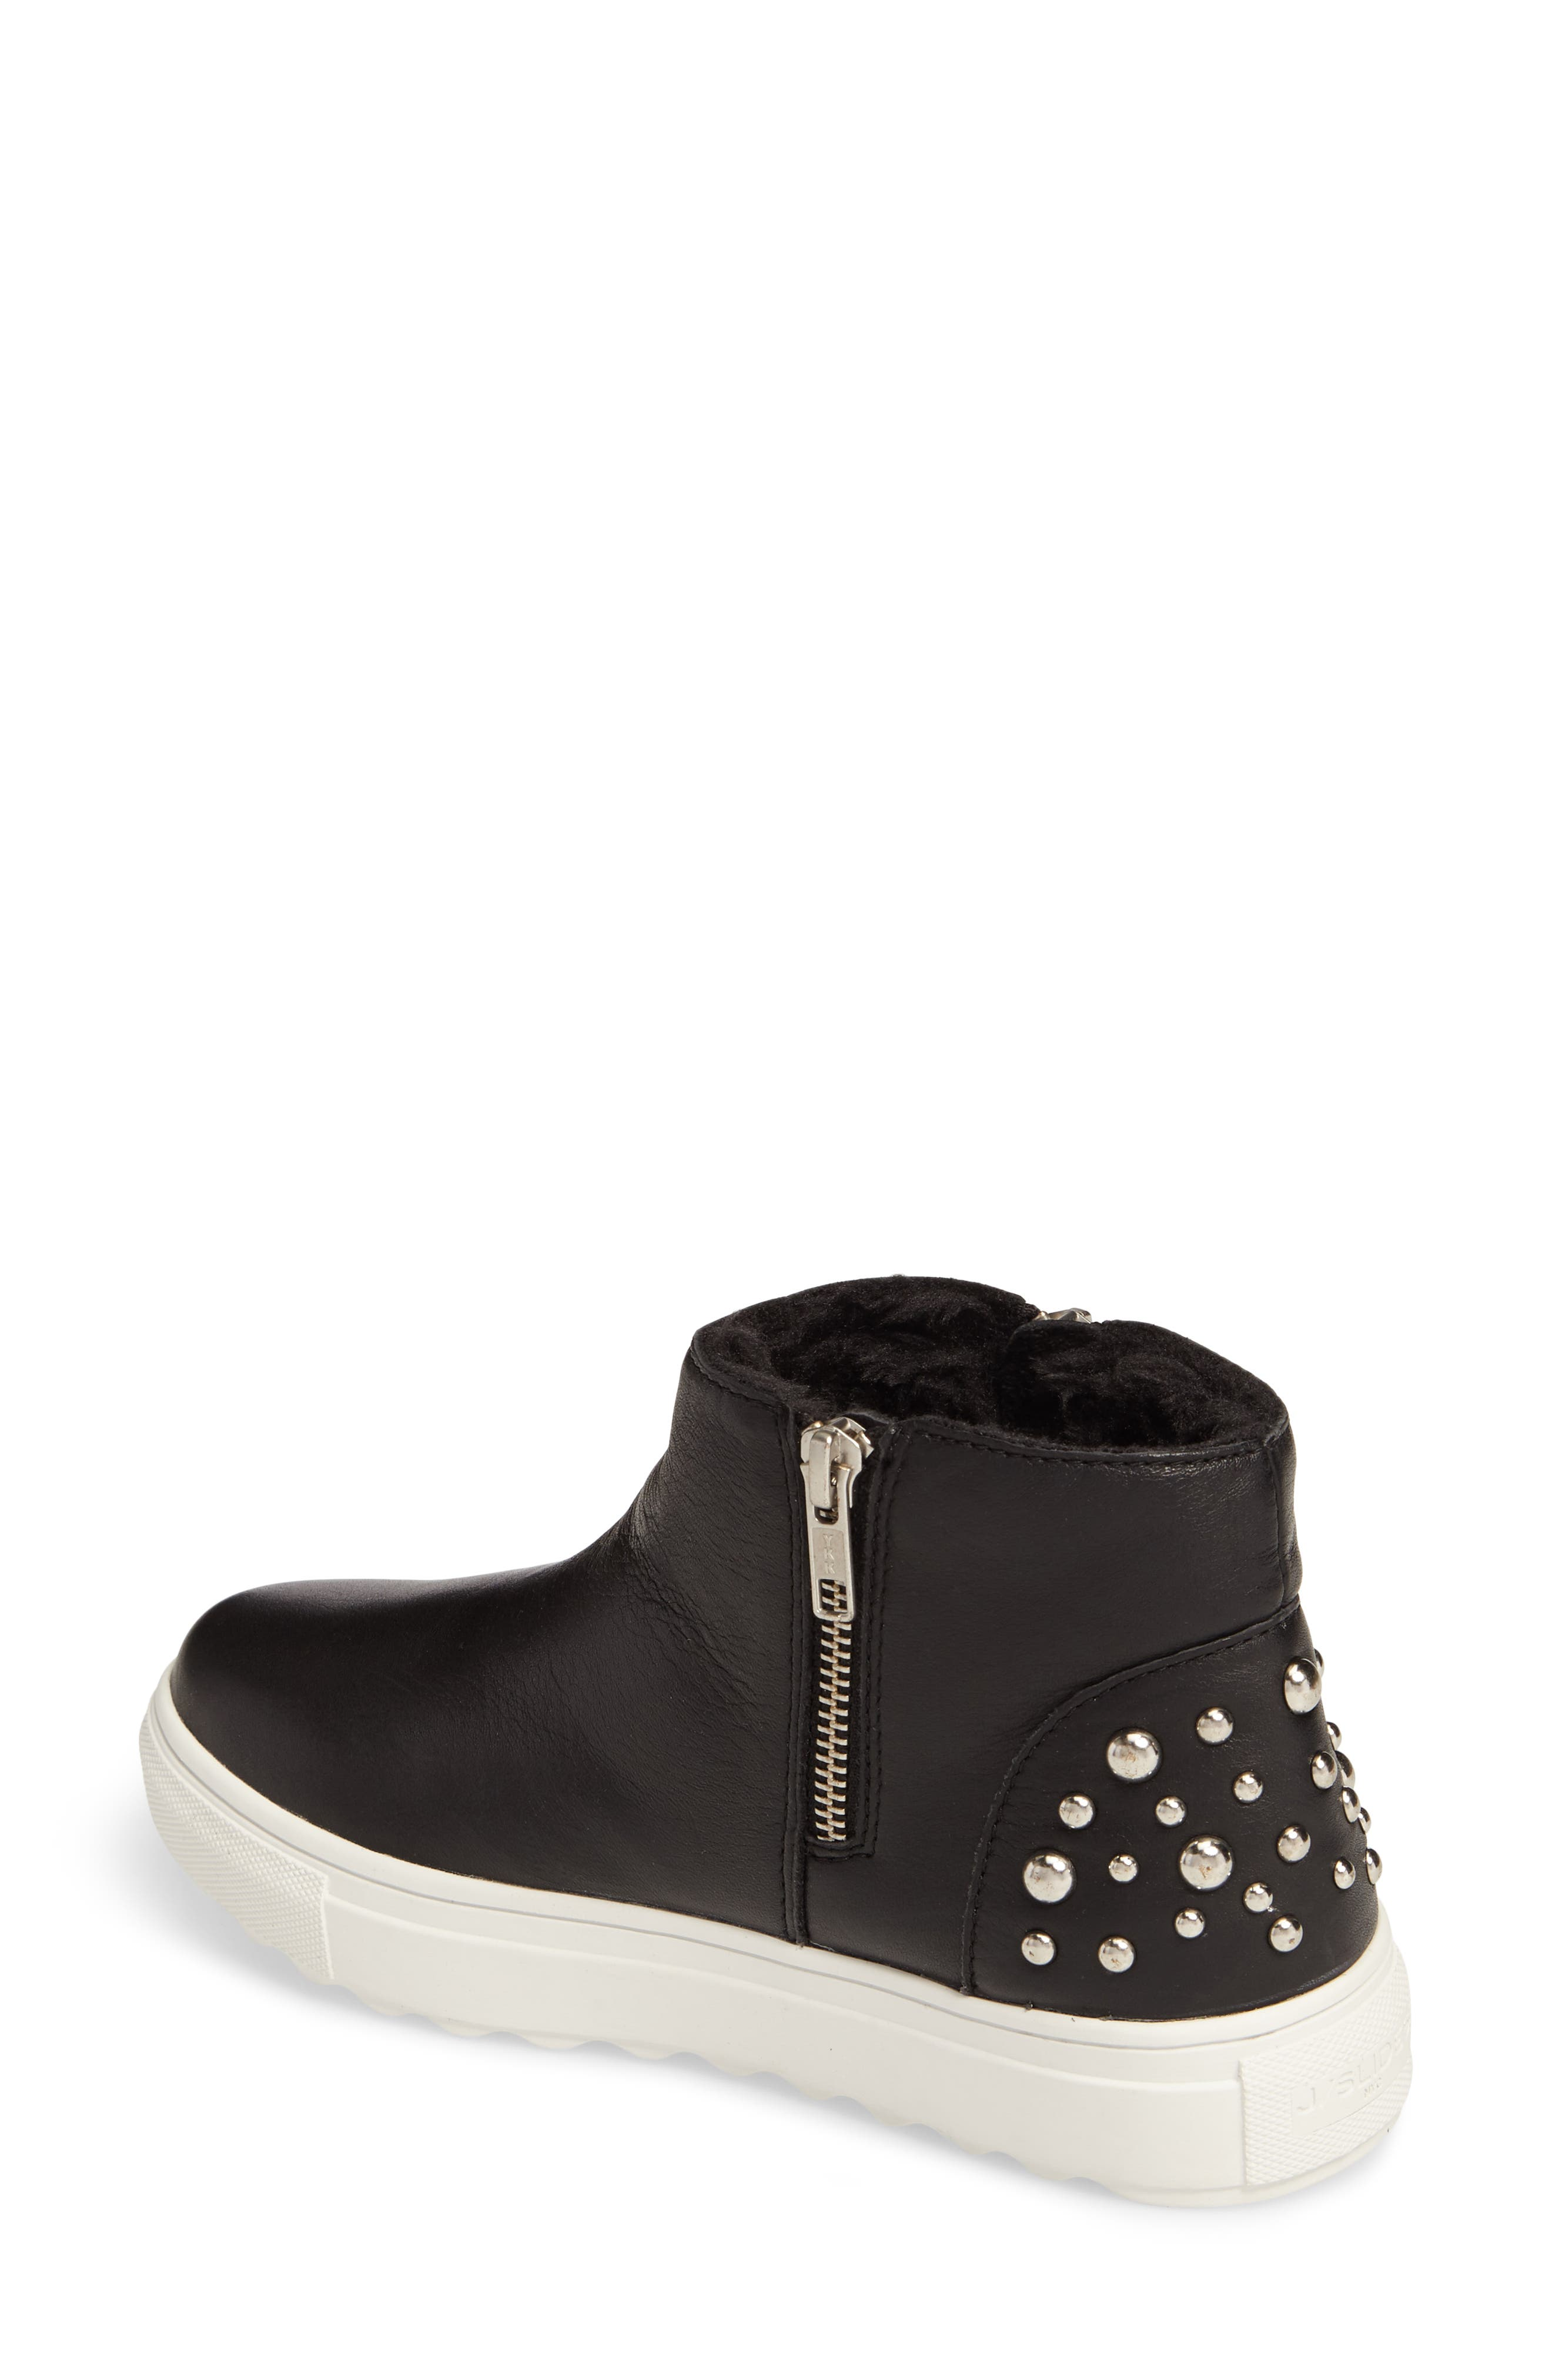 Pele Boot,                             Alternate thumbnail 2, color,                             Black Leather